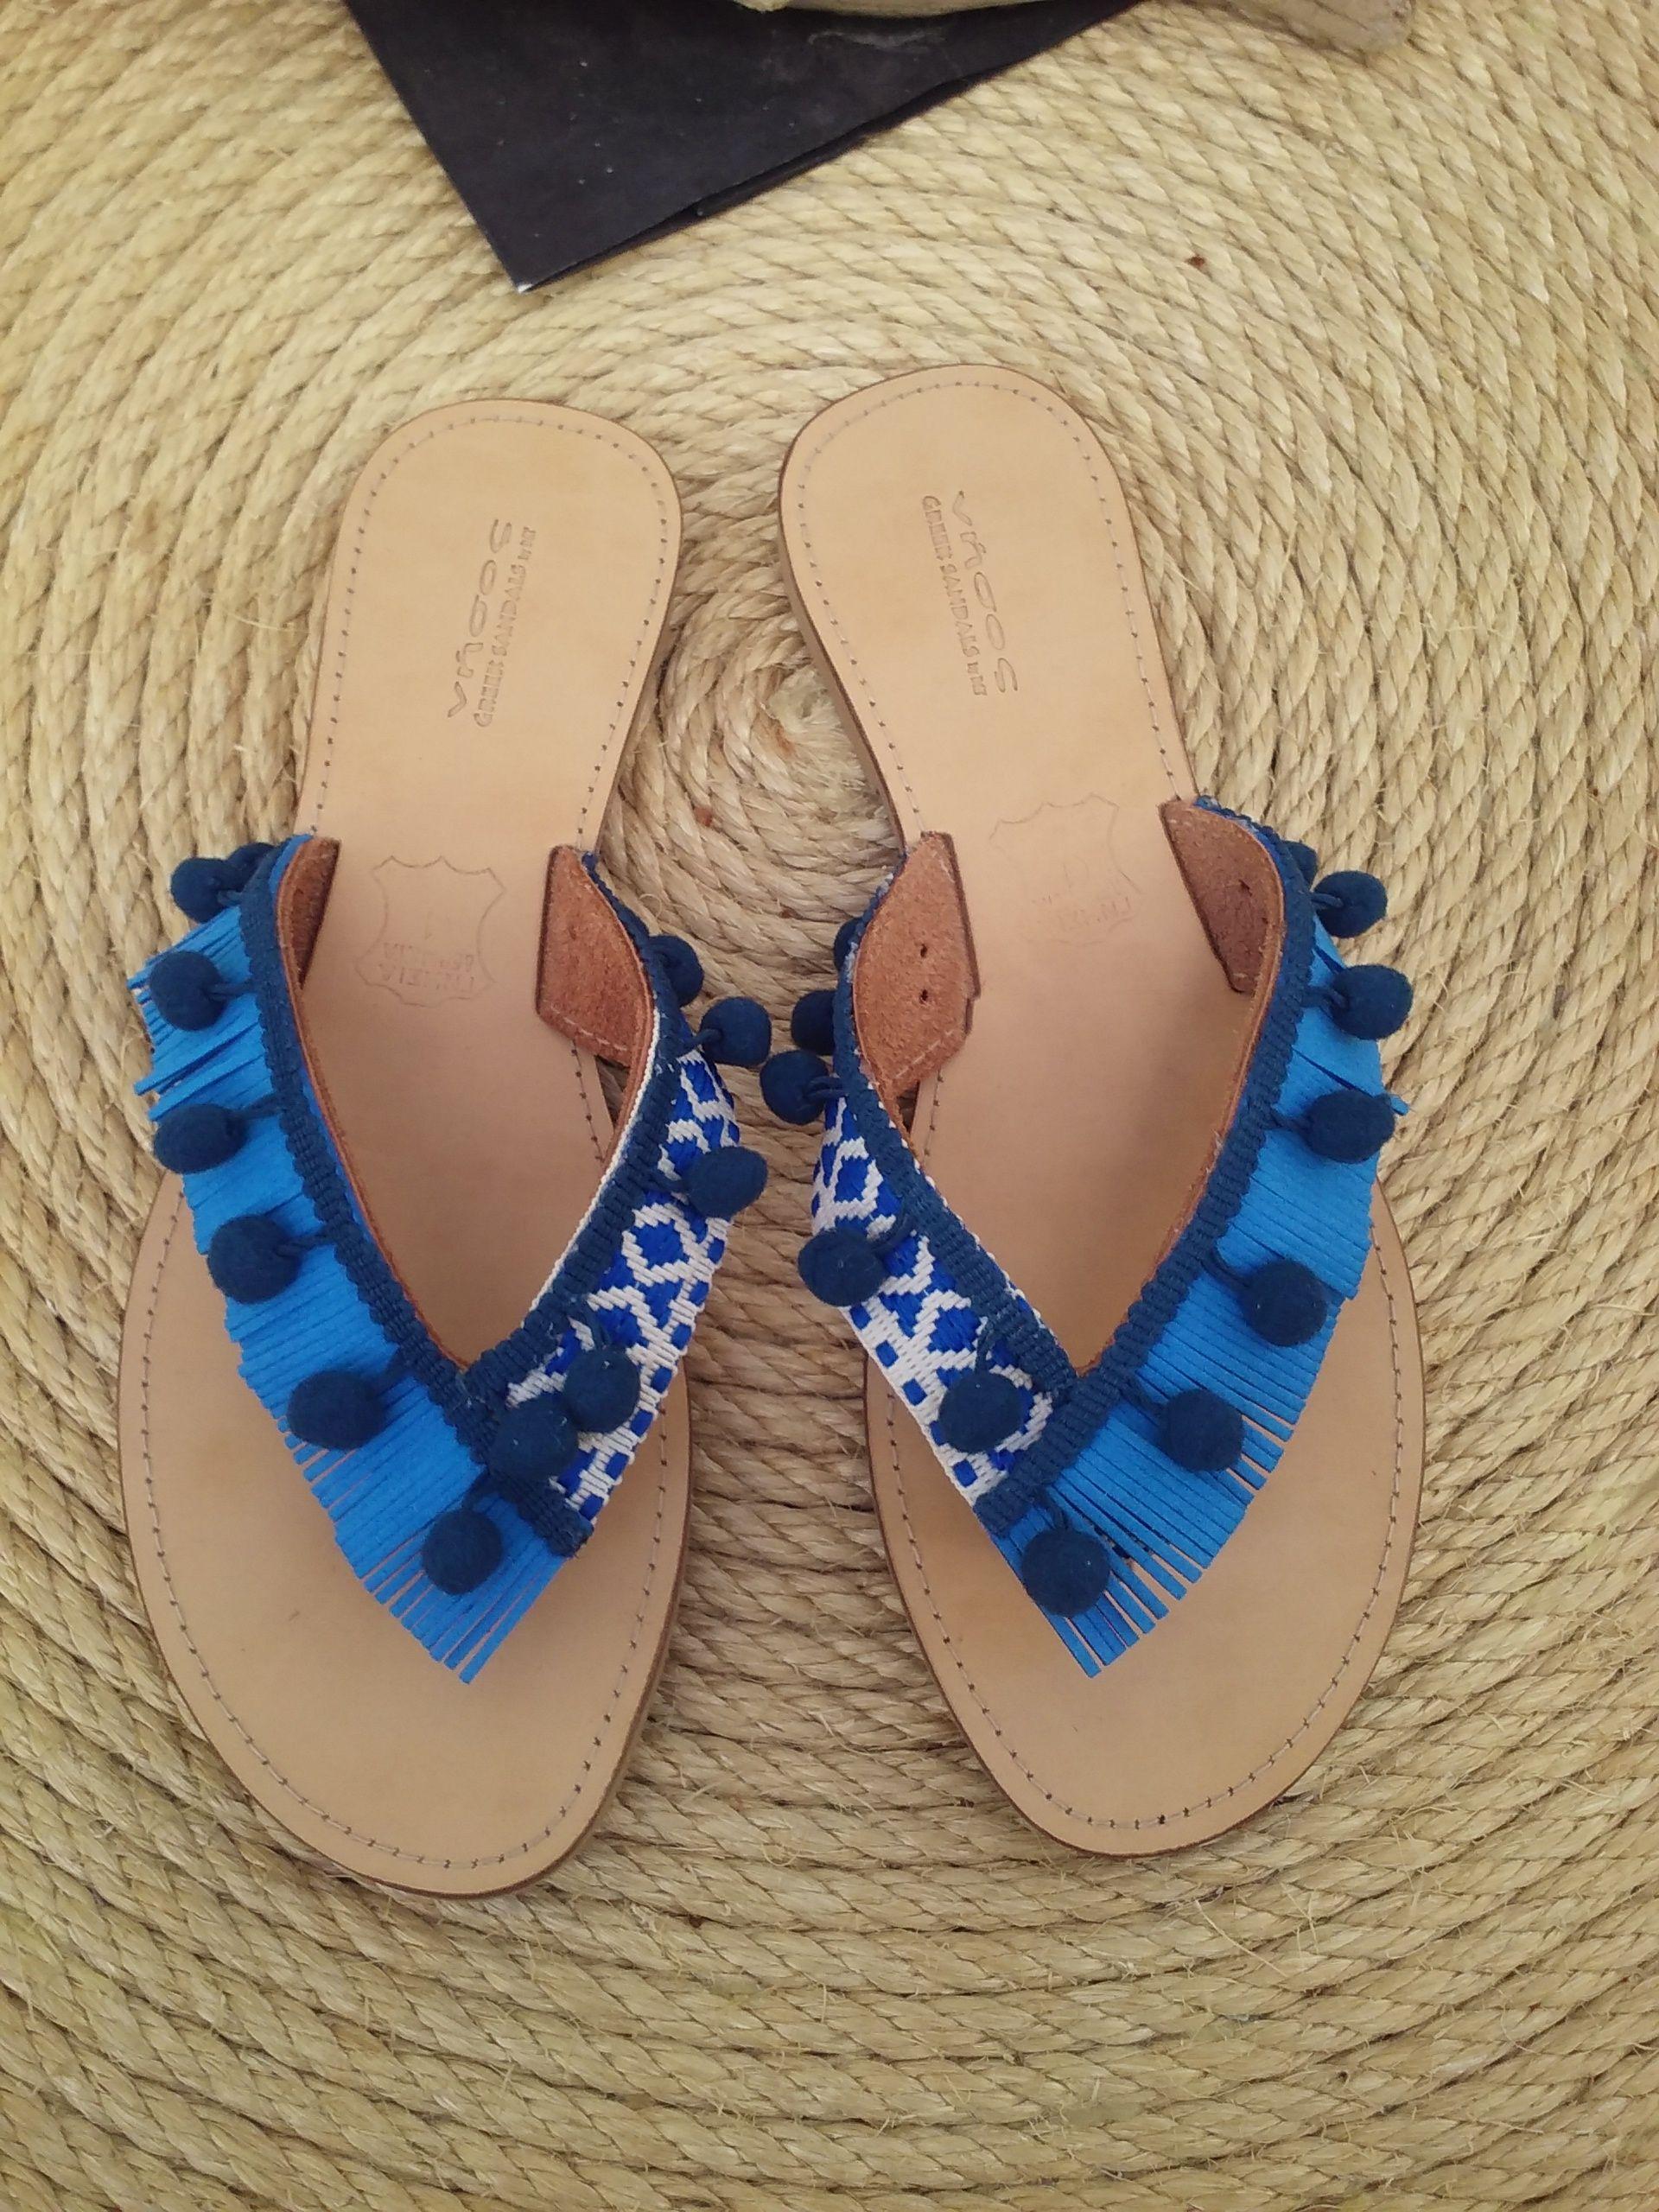 d4ec213ab11 Boho style sandals Χειροποίητα δερμάτινα σανδάλια   Νήσος by D&T ...